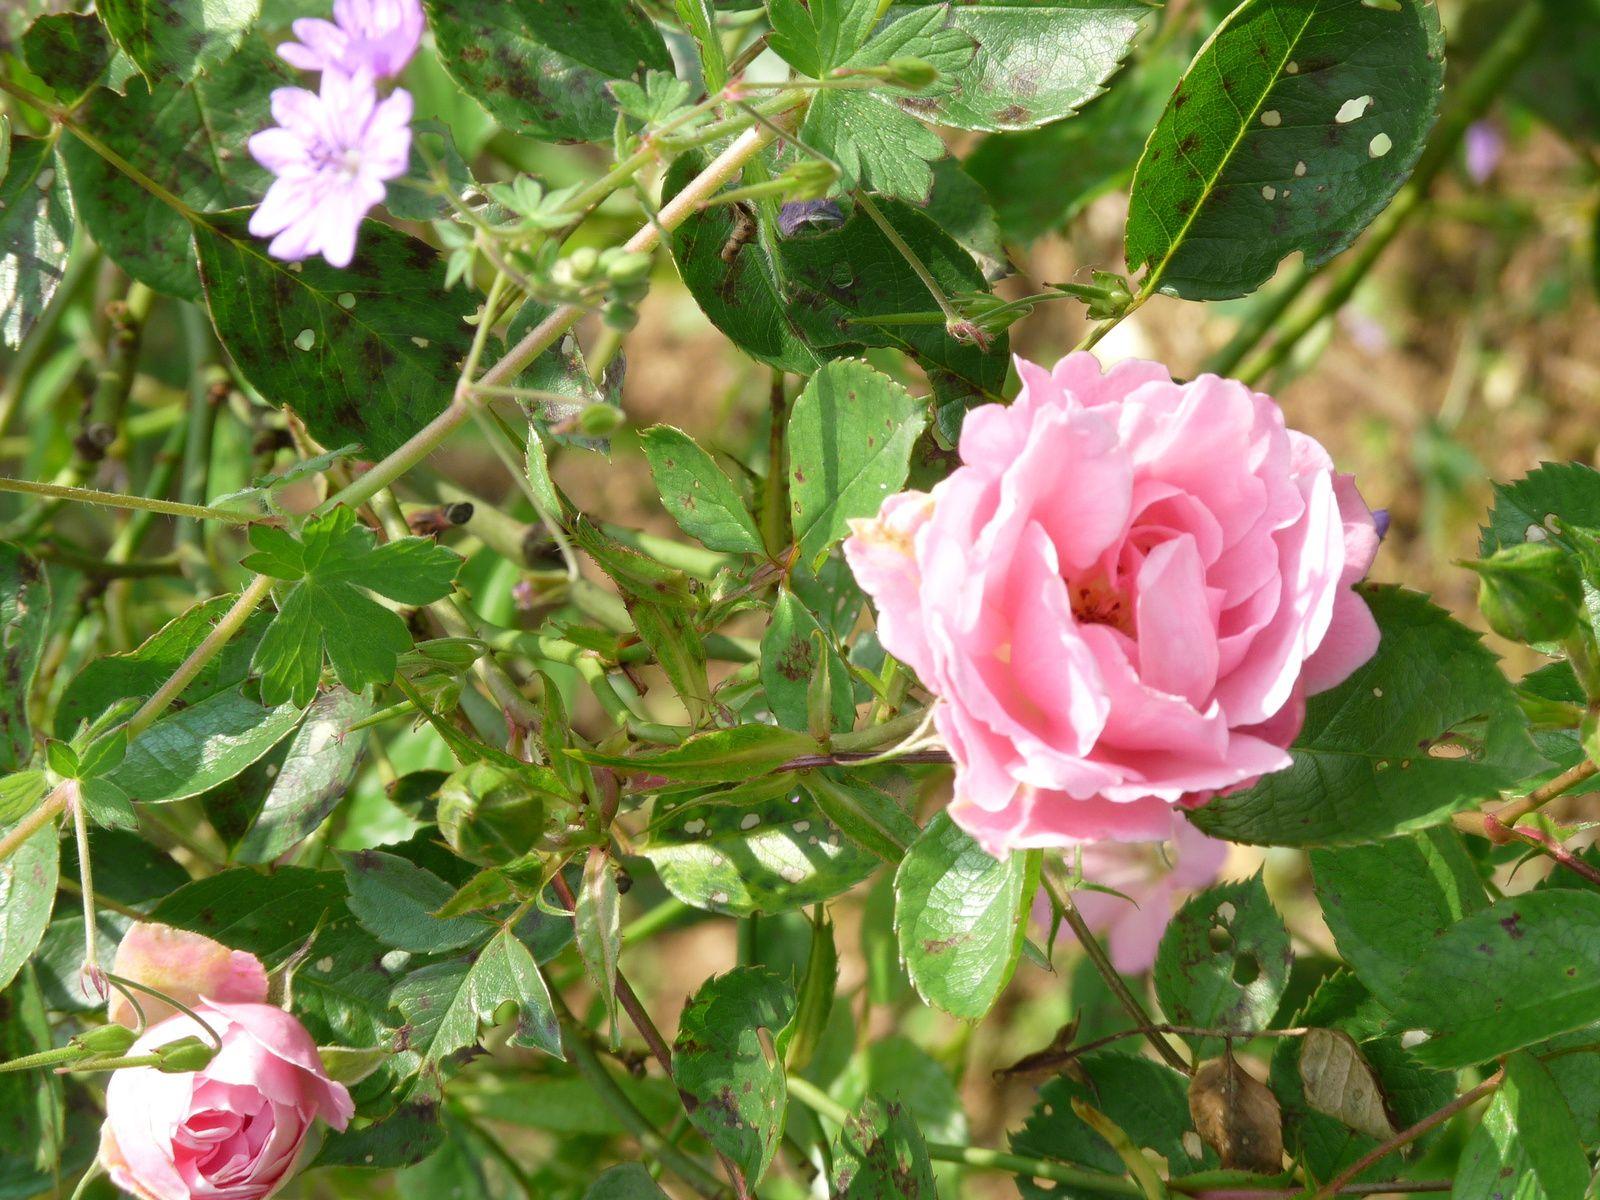 Linaria Purpurea Canon Went 2015 de Josiane, Aquilegia Caerulea rose Queen, Rosier Magical Moment et Yellow Changelling de Warren, rosier Vent d'été